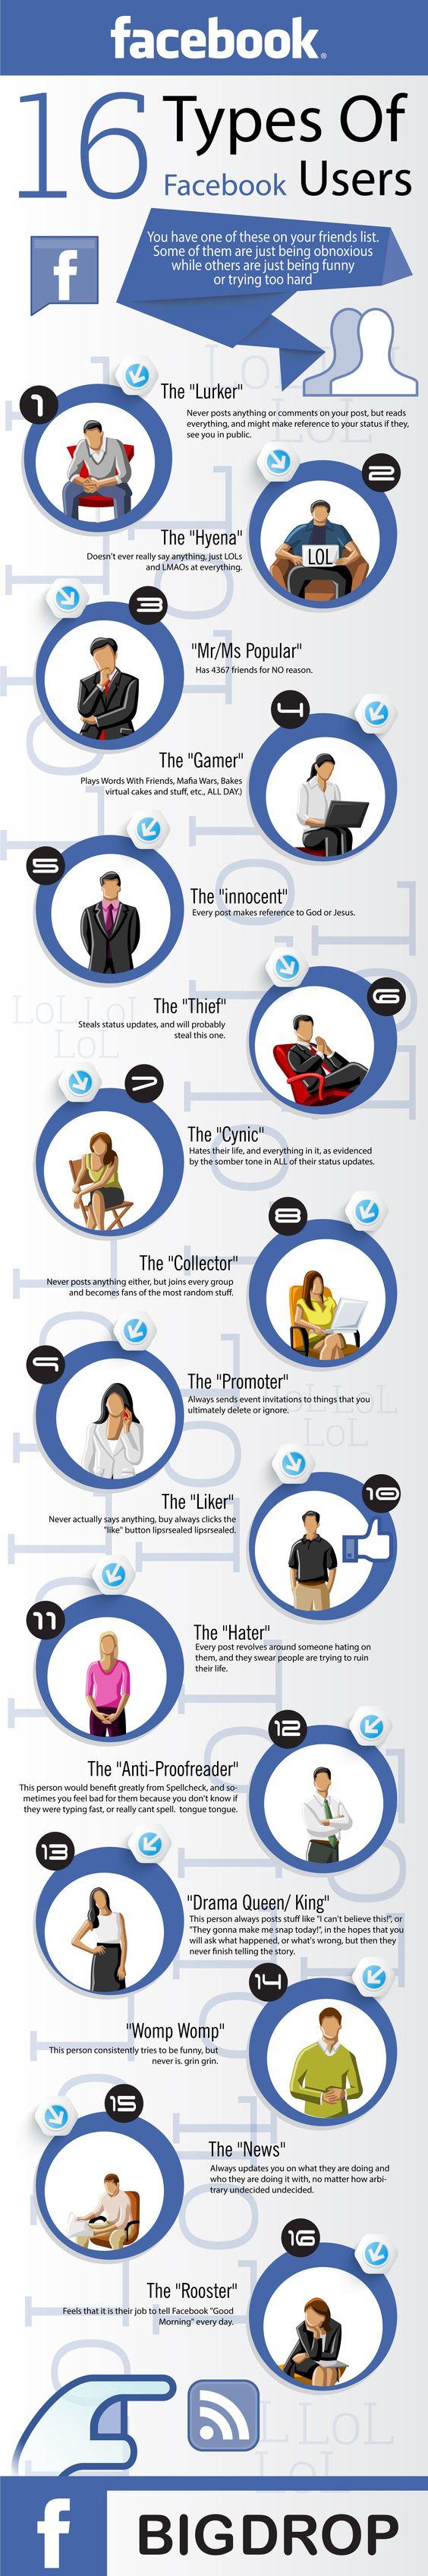 16 Types Of Facebook Users  #Infographic #Facebook #SocialMedia